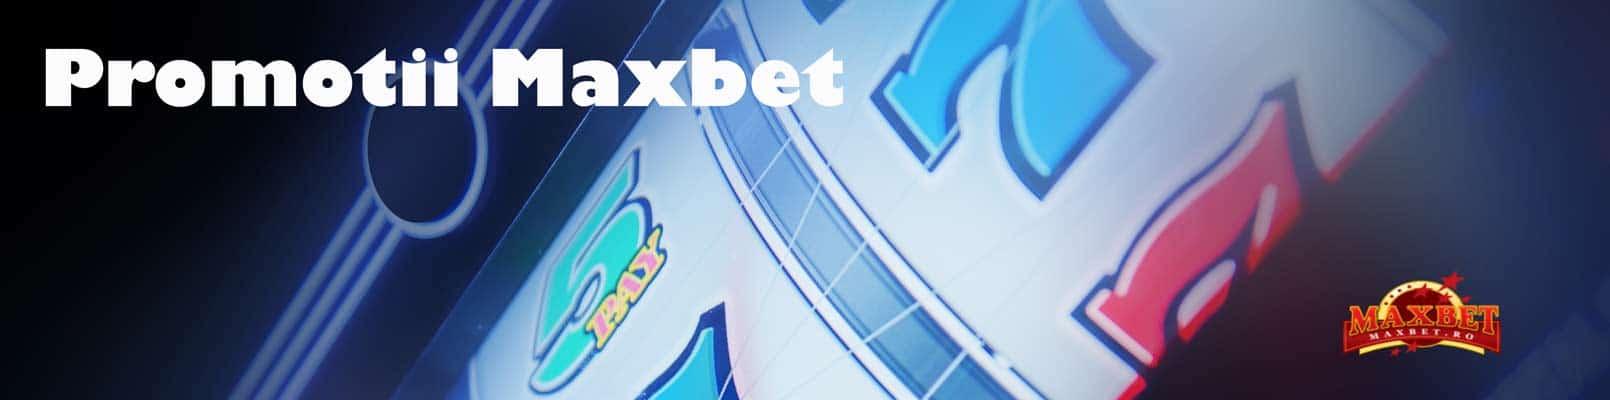 info oferte promotii maxbet fara depunere